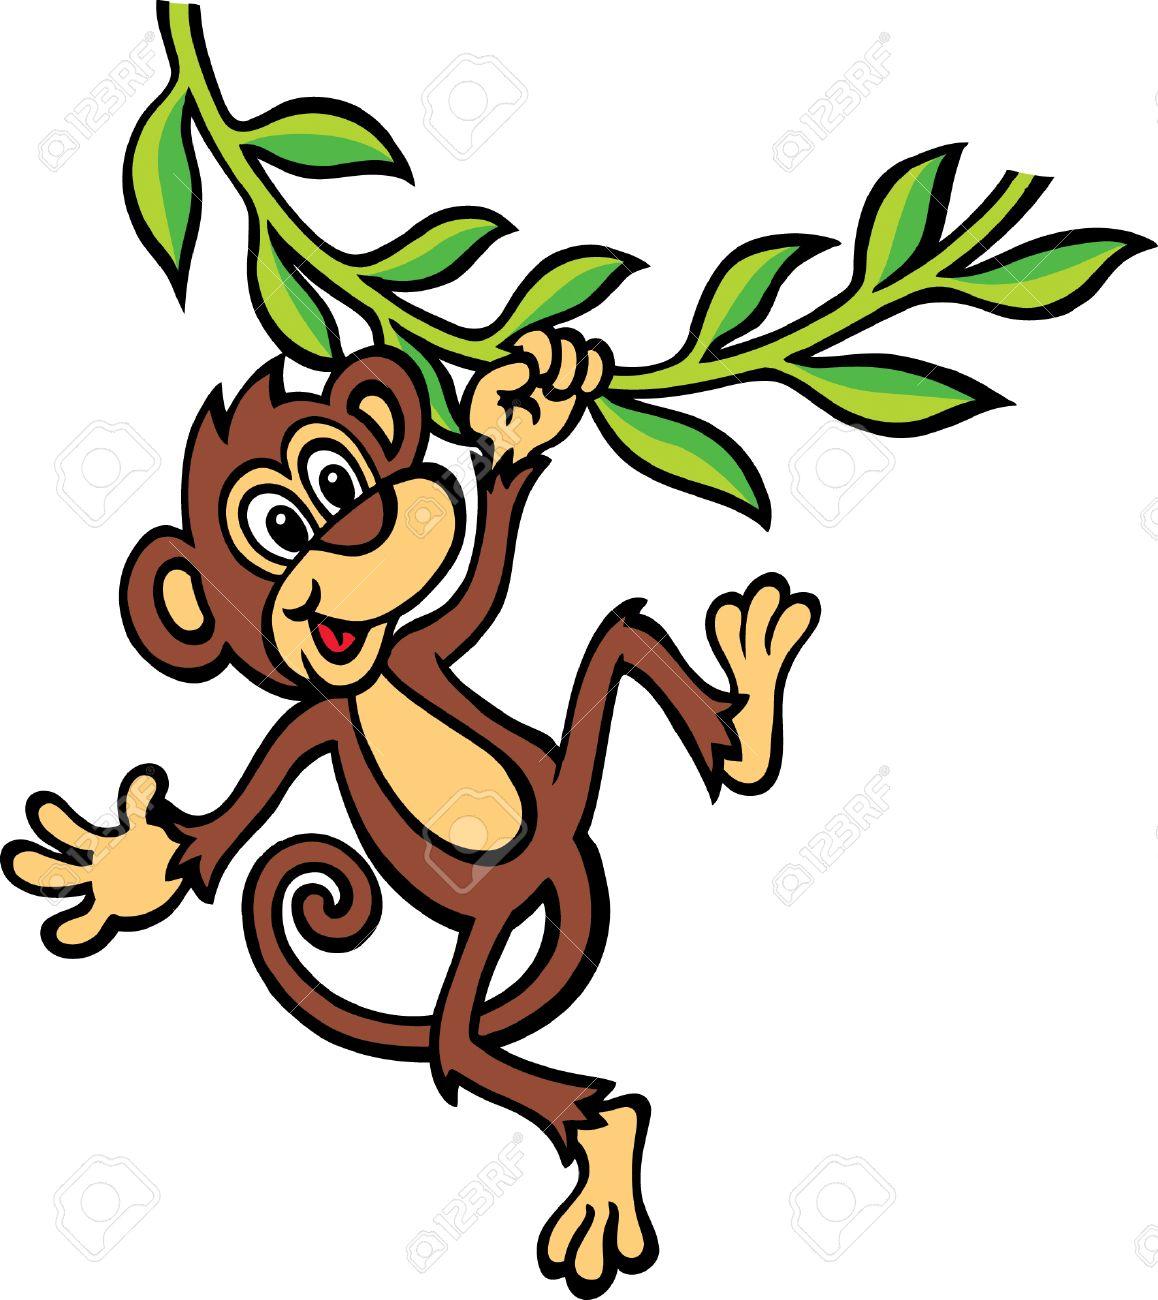 Monkey shirt spank t